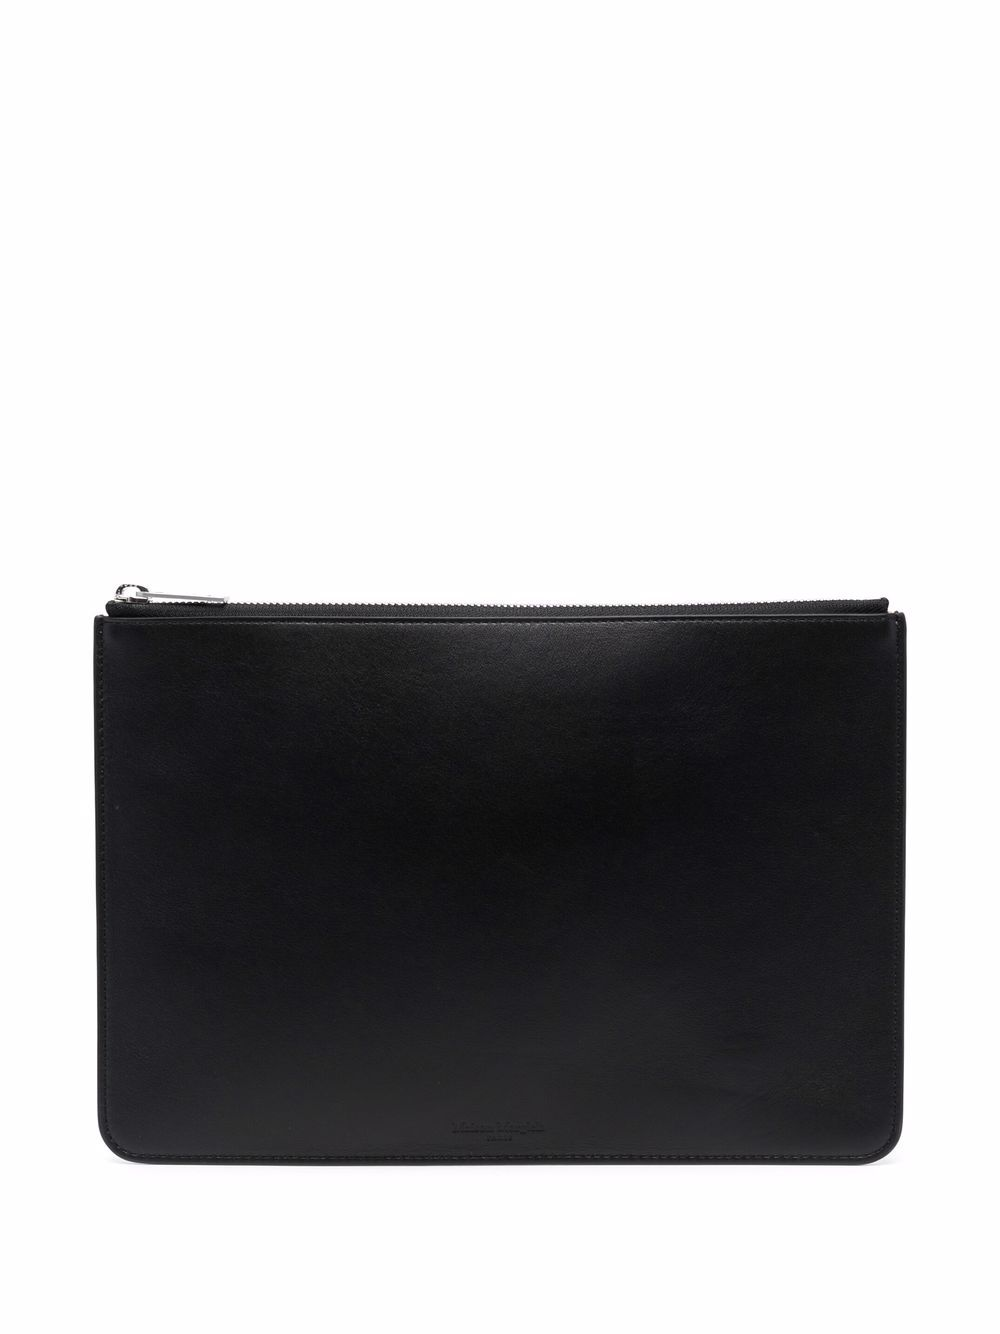 portafoglio in pelle uomo nero MAISON MARGIELA | Portafogli | S55UI0192 P4303T8013